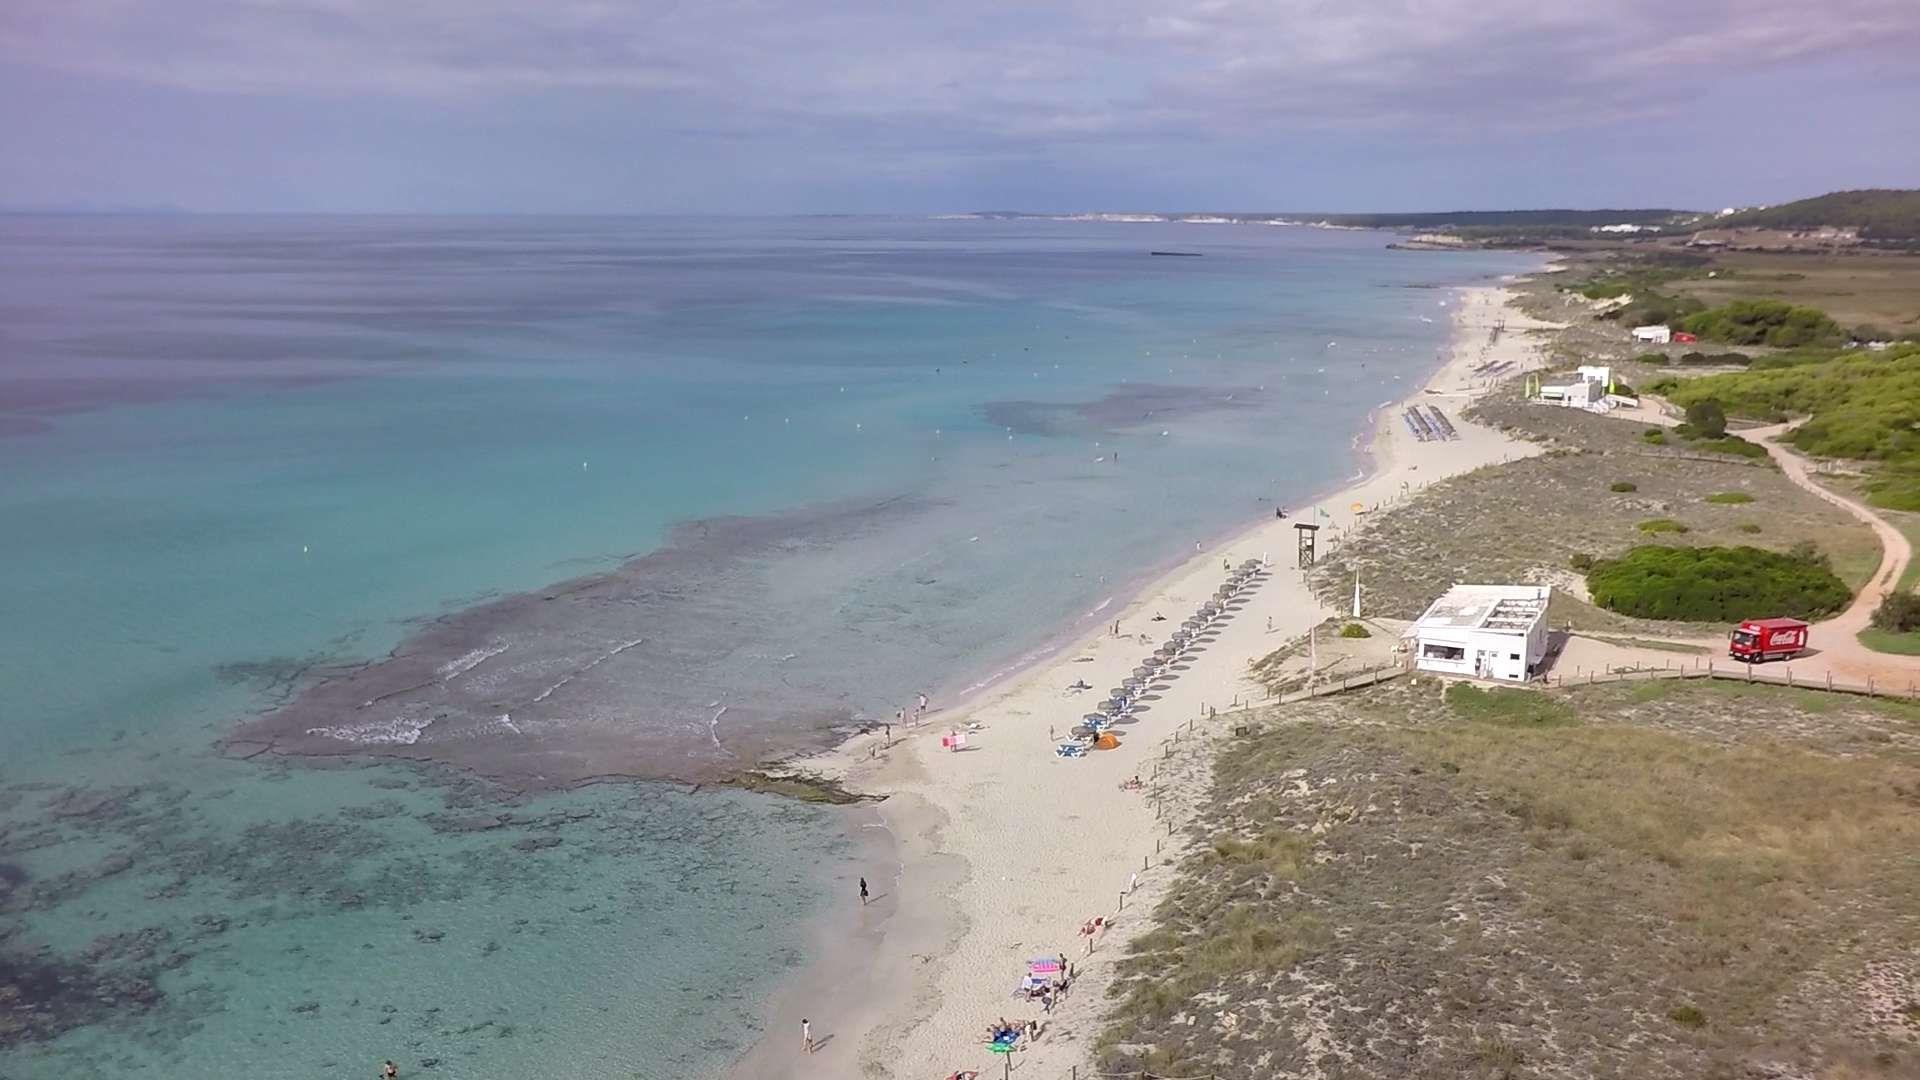 Son Bou beach in Menorca (Balearics Island - Spain)